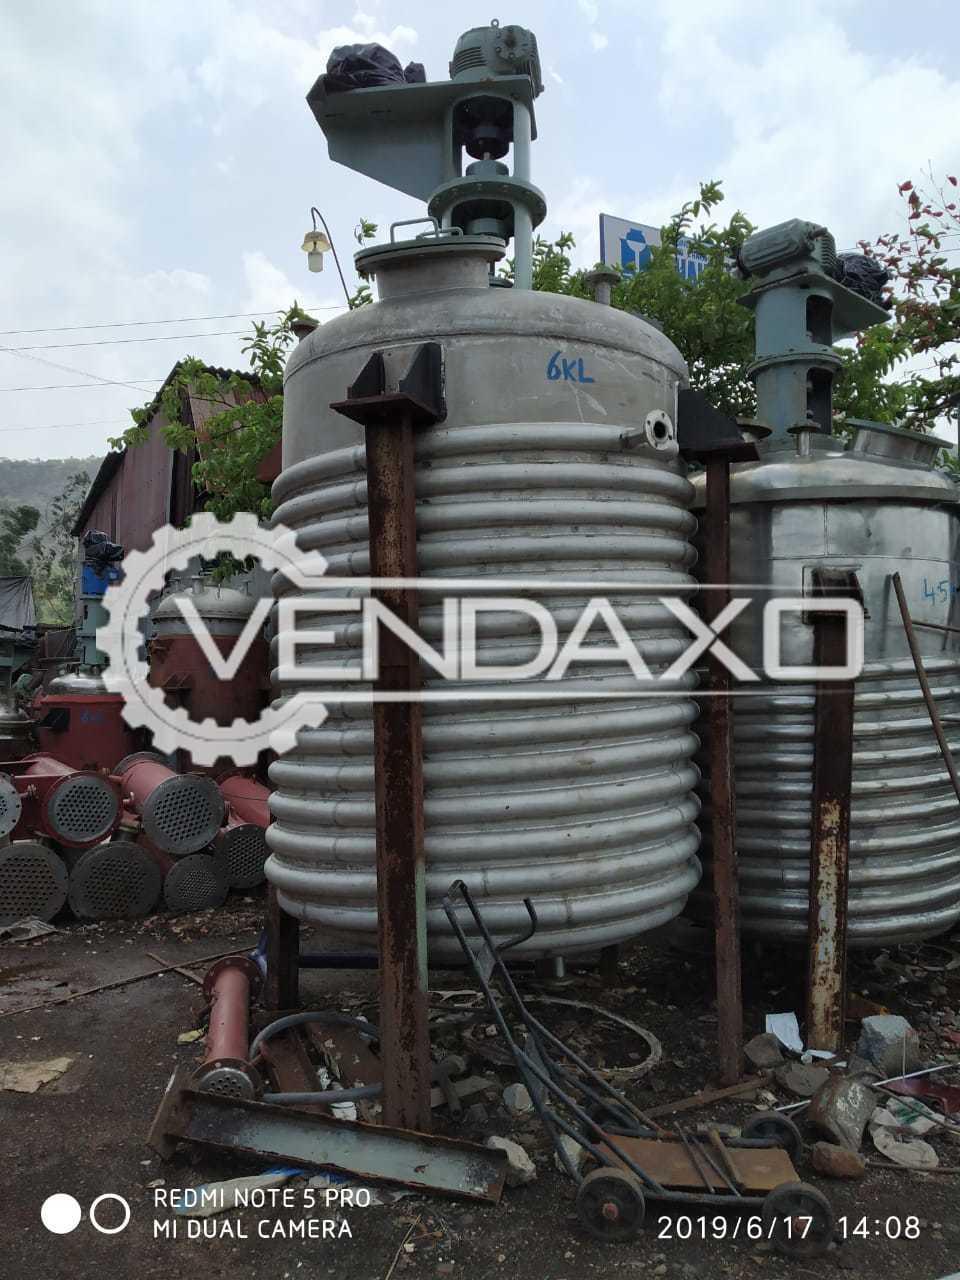 Indian Make Reactor - 6 KL